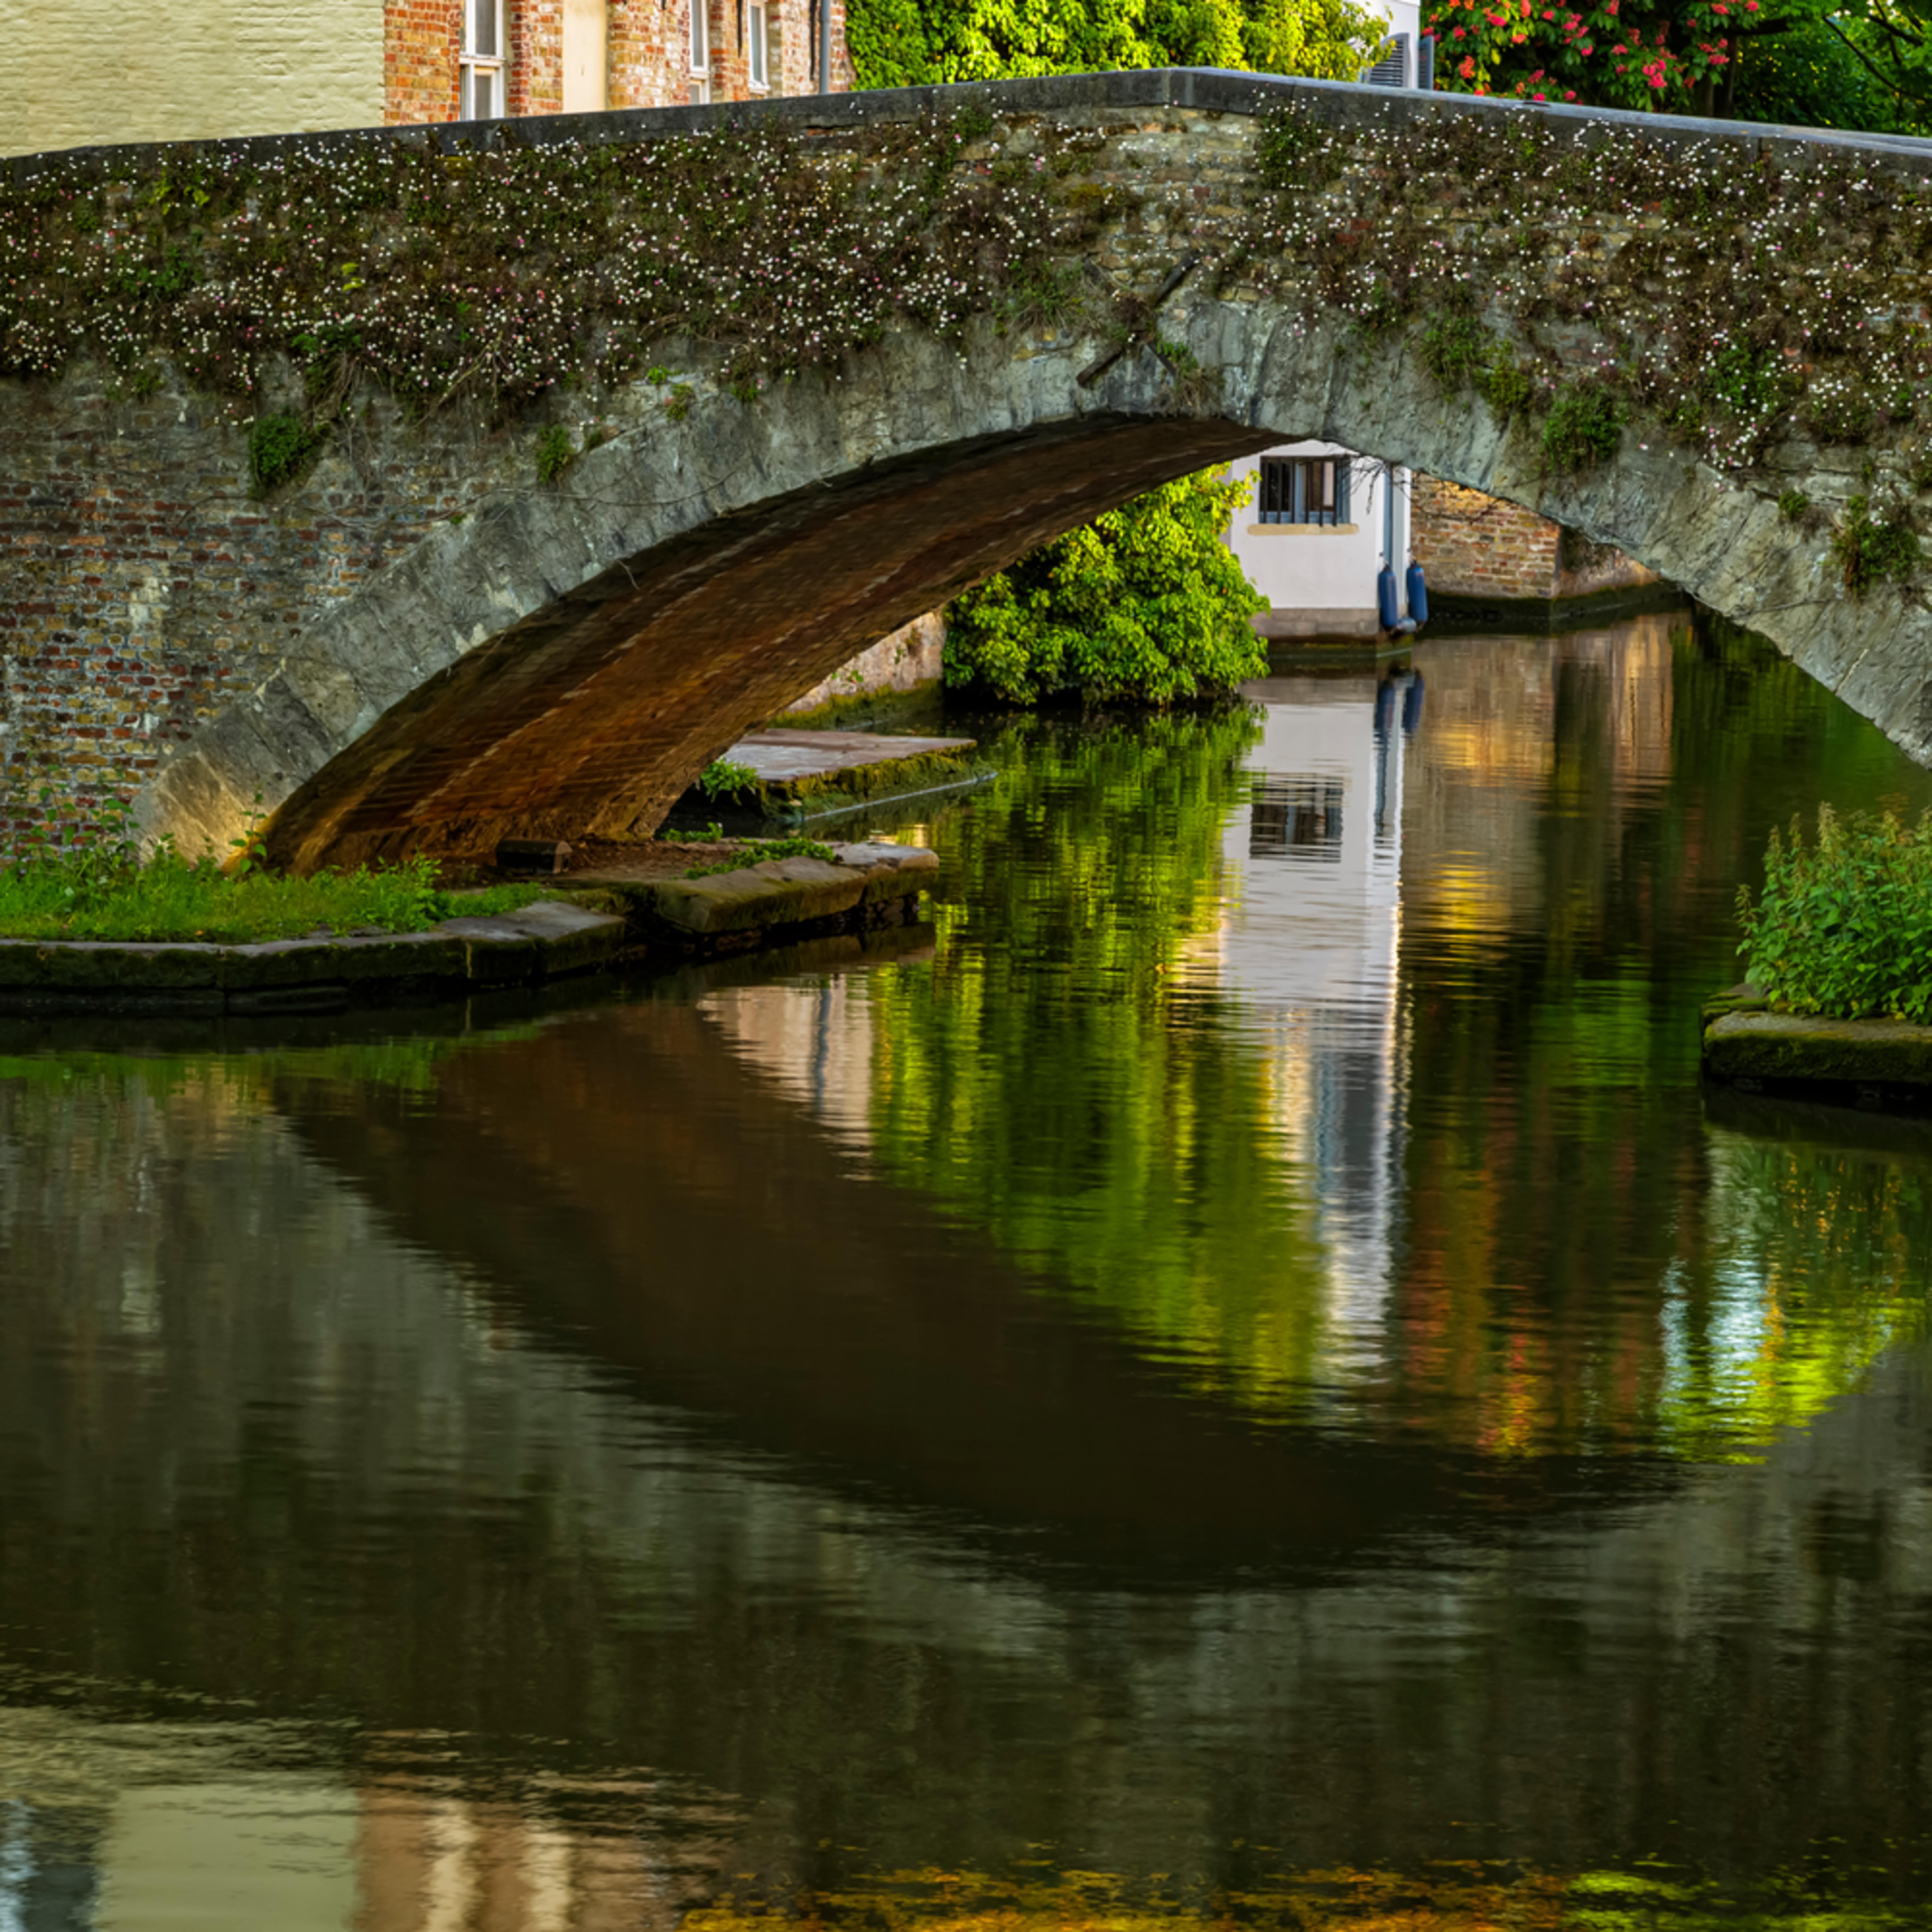 Bruges bridge n60a2500 z8izxp